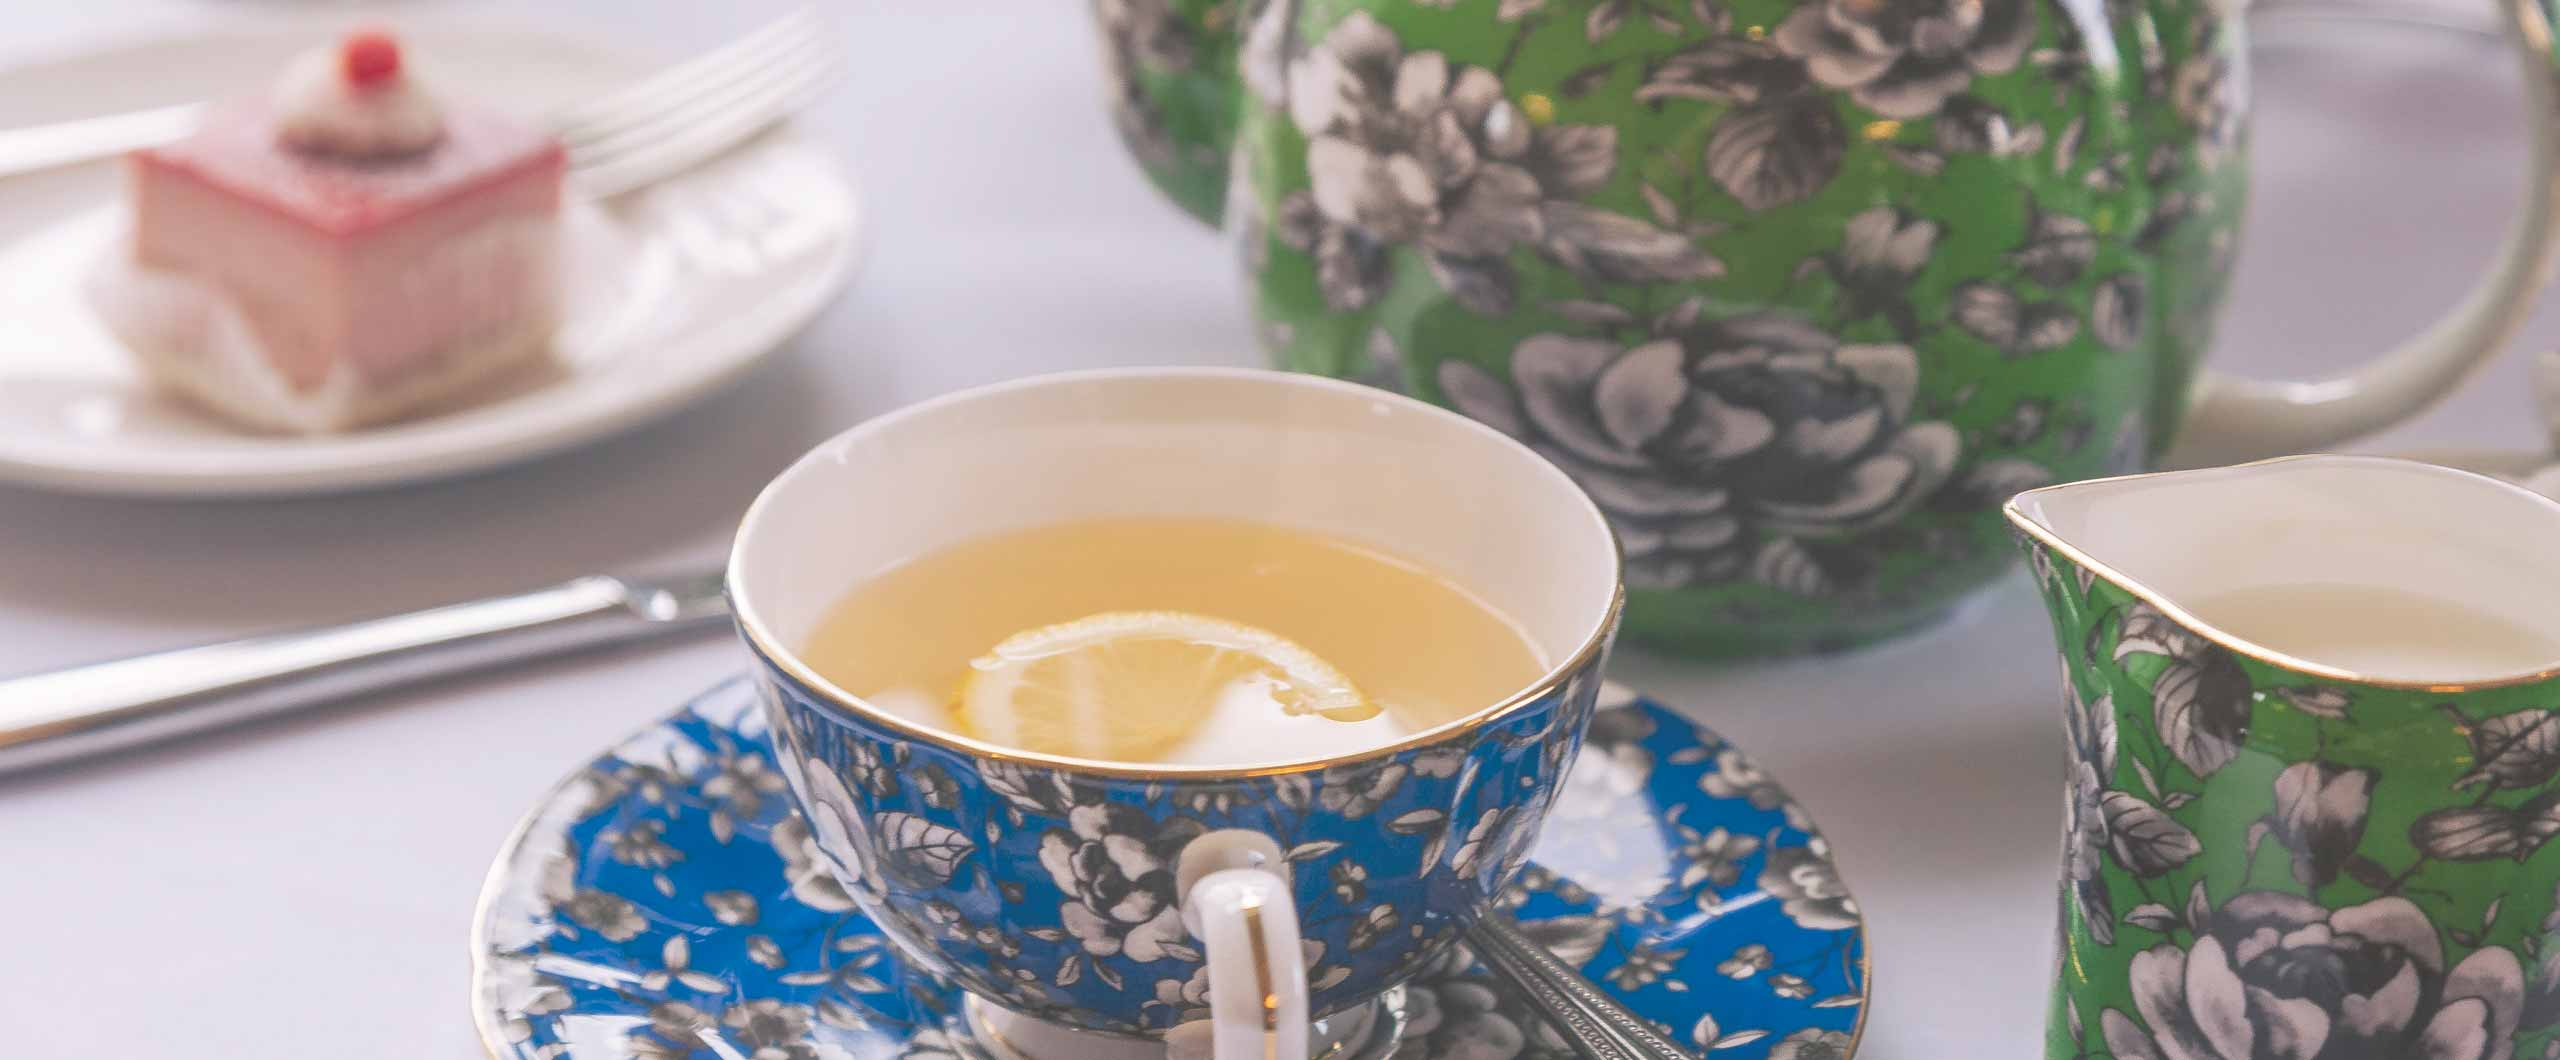 Afternoon Tea in Surrey